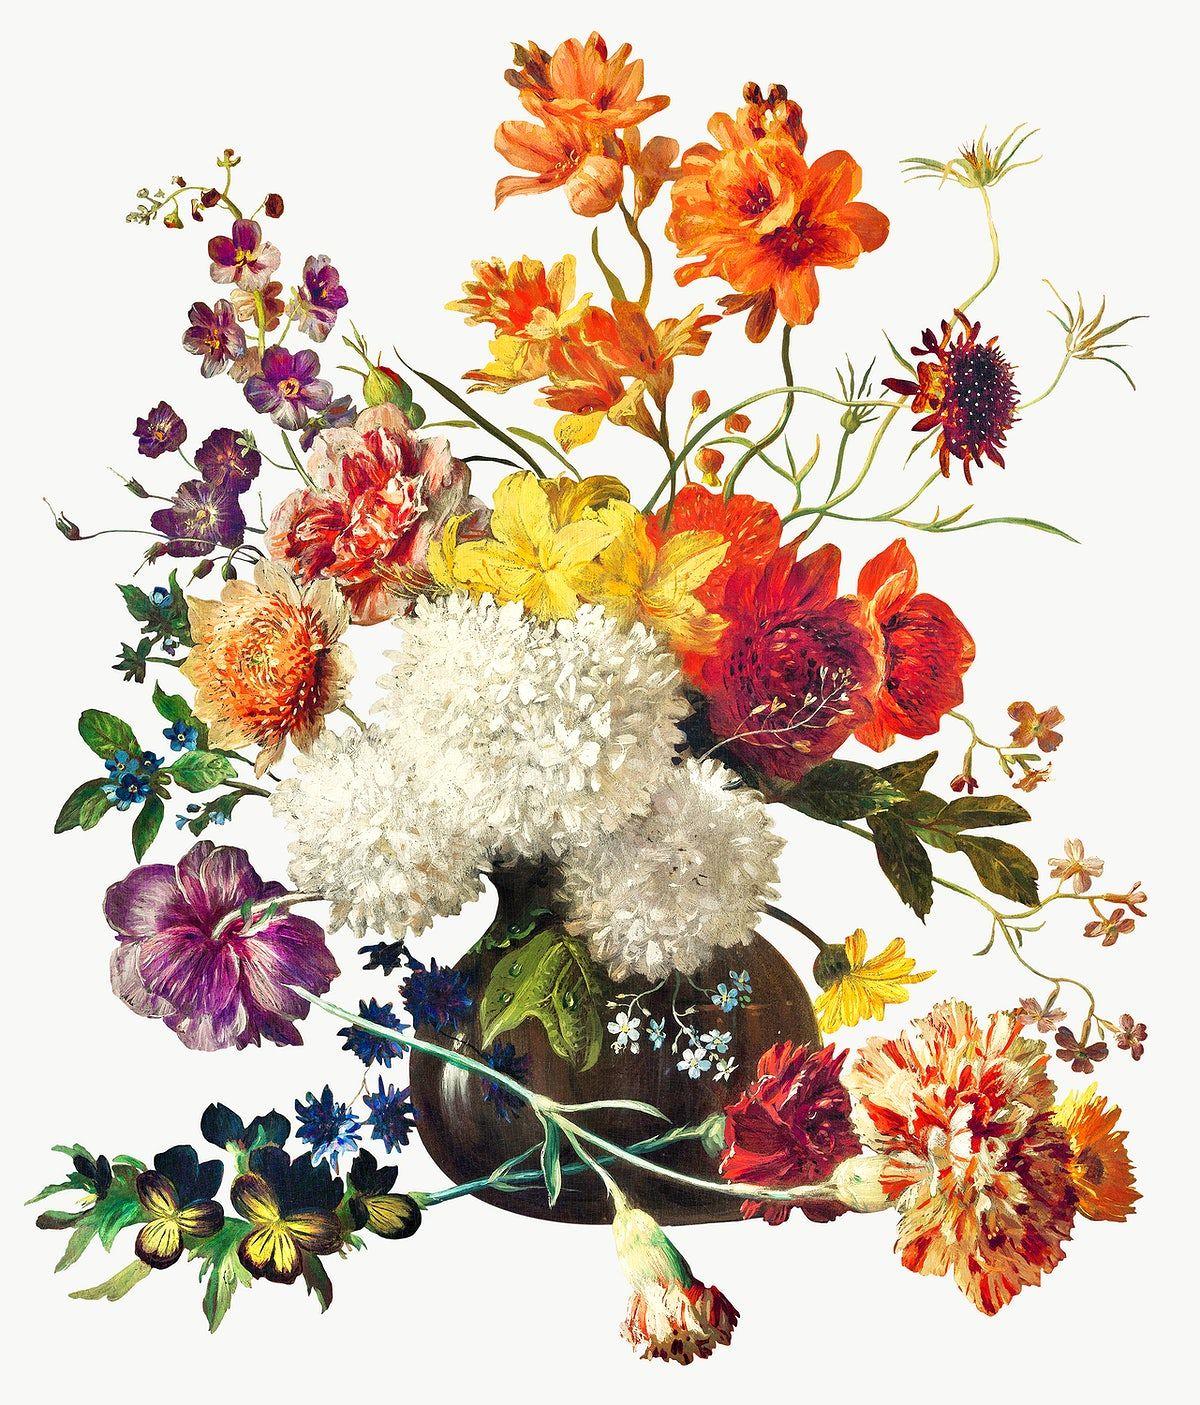 Vintage Flower Biuquet In A Vase Design Element Free Image By Rawpixel Com Nap In 2020 Flower Illustration Illustration Vase Design